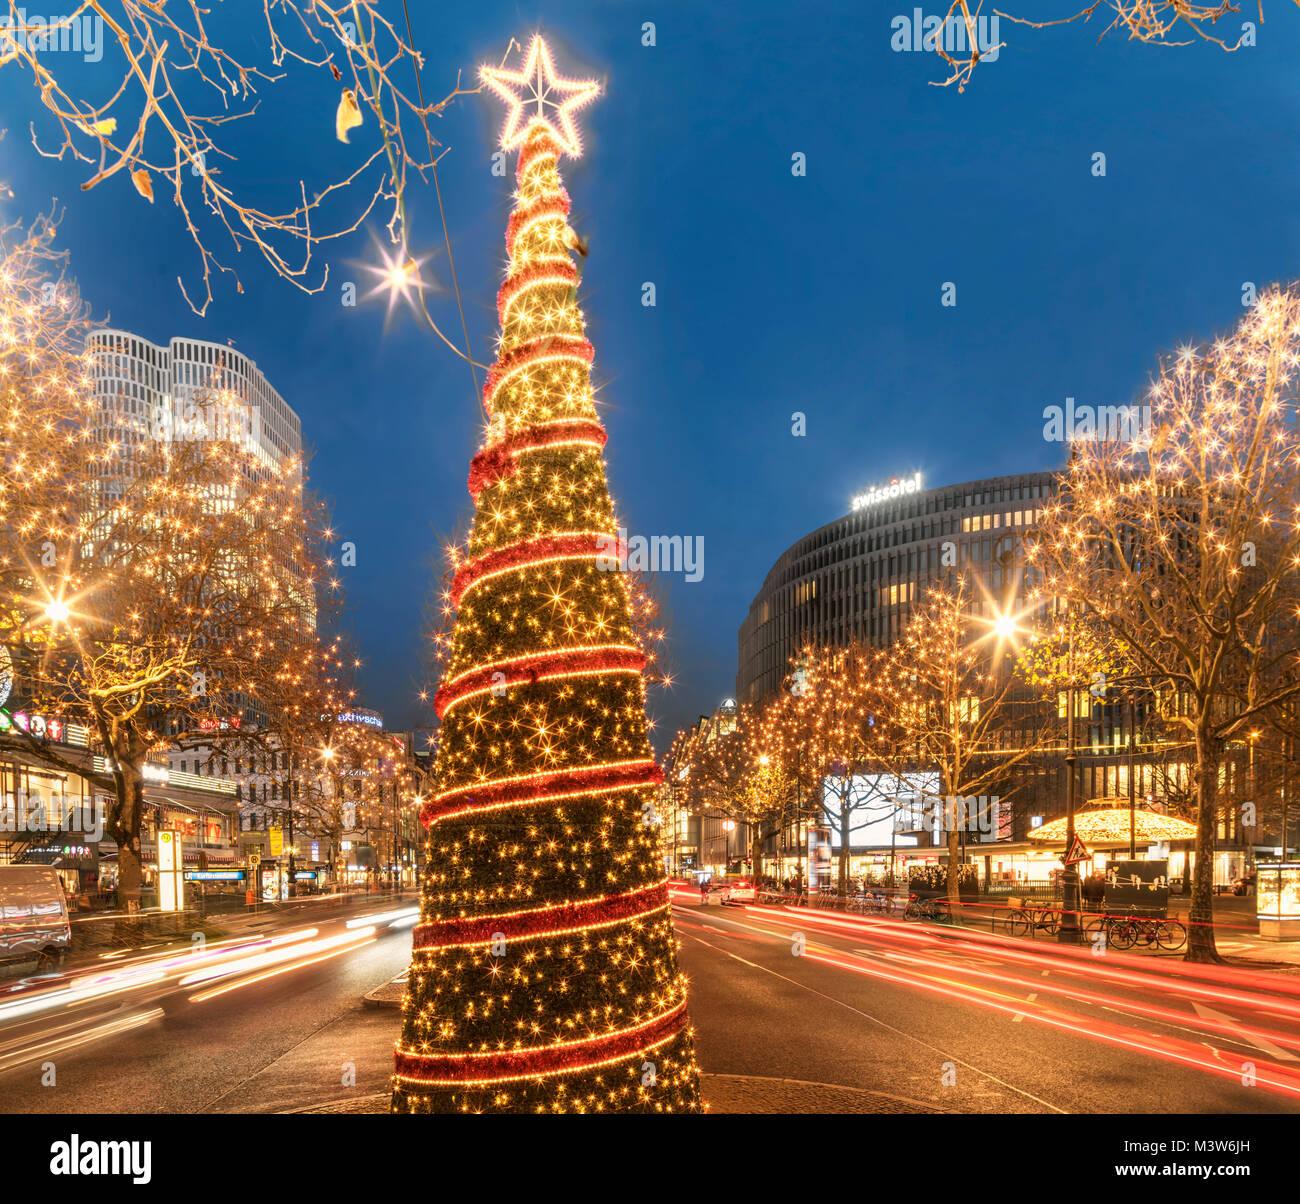 Christmas illumination, Kurfuerstendamm, Kuhdamm,  Berlin - Stock Image